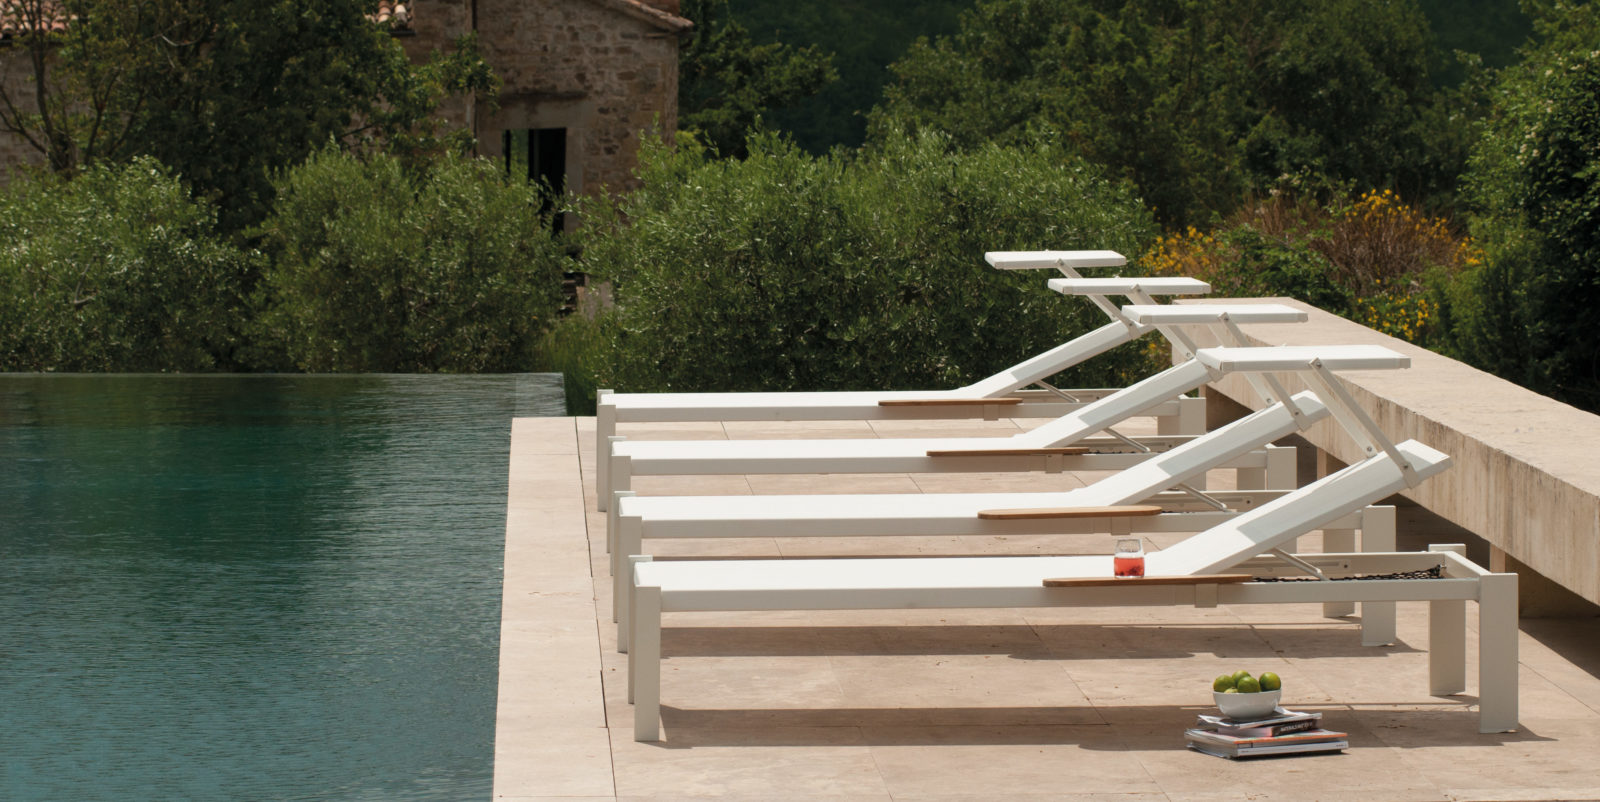 Bain de soleil design buxus